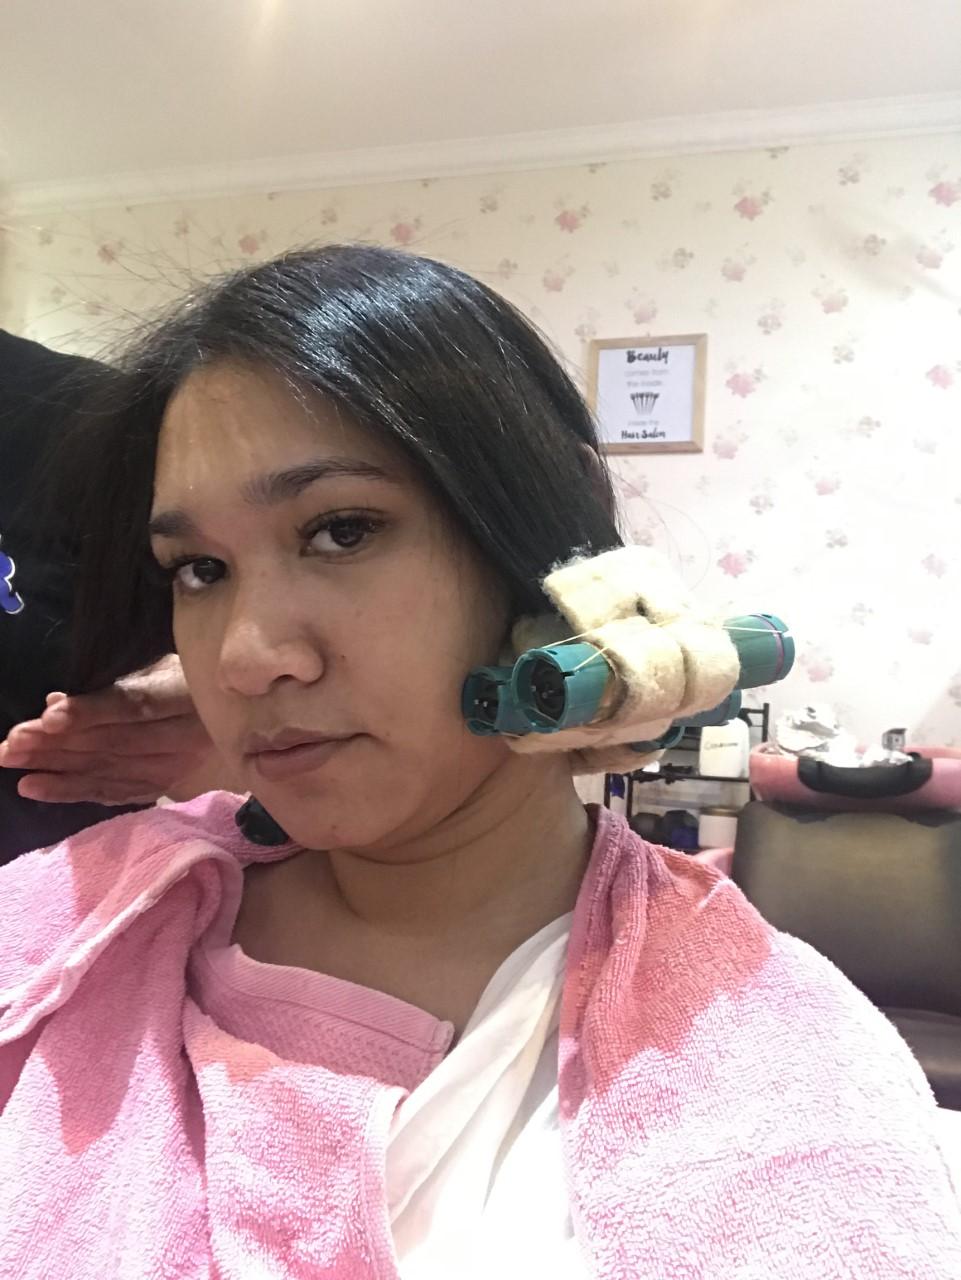 Review Permanent Blow At Kalea Beauty Bar Wonderland Of Mine